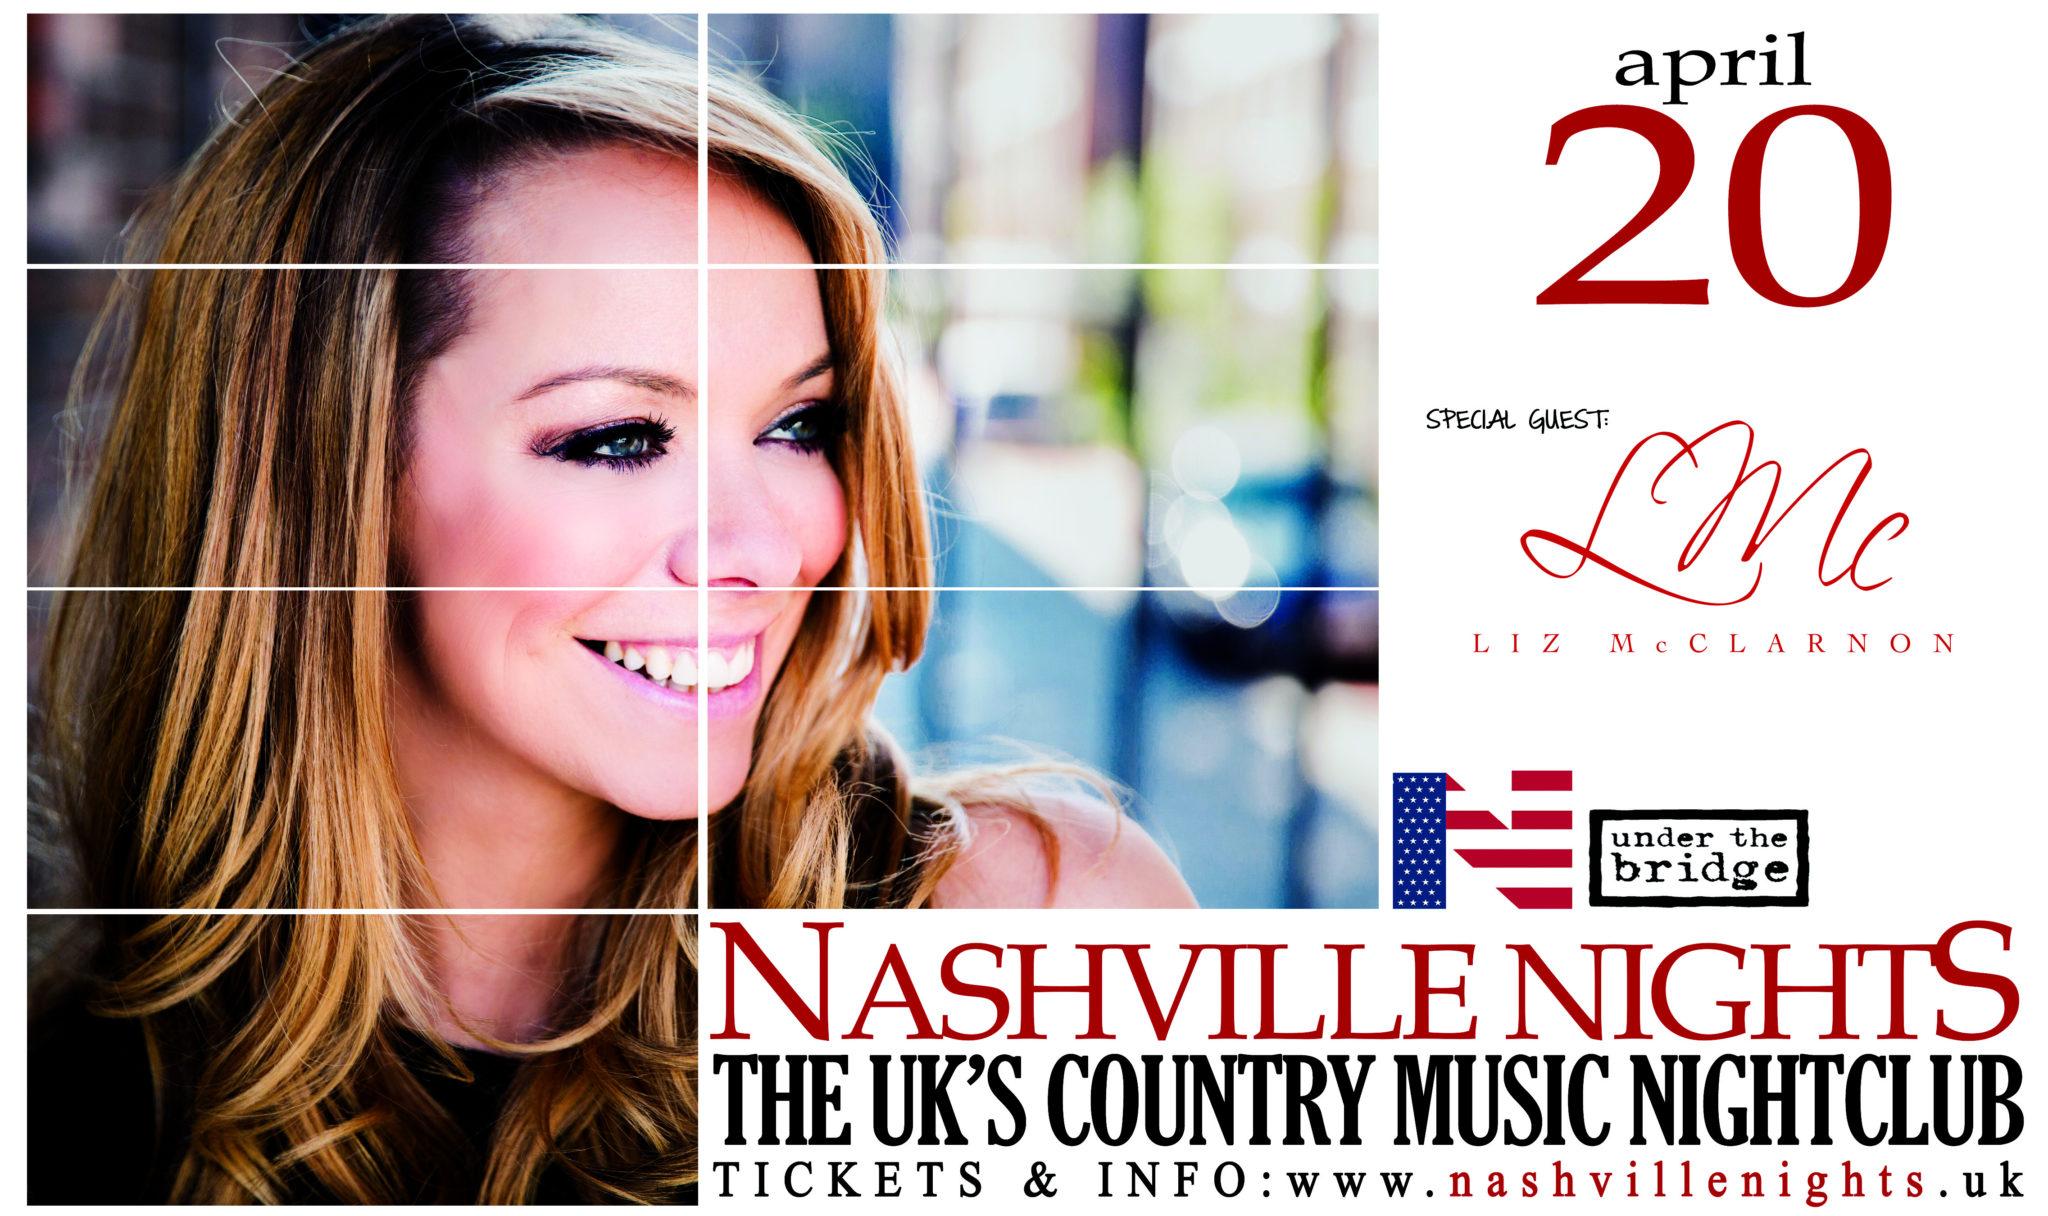 Liz McClarnon at Nashville Nights, Chelsea, 20th April